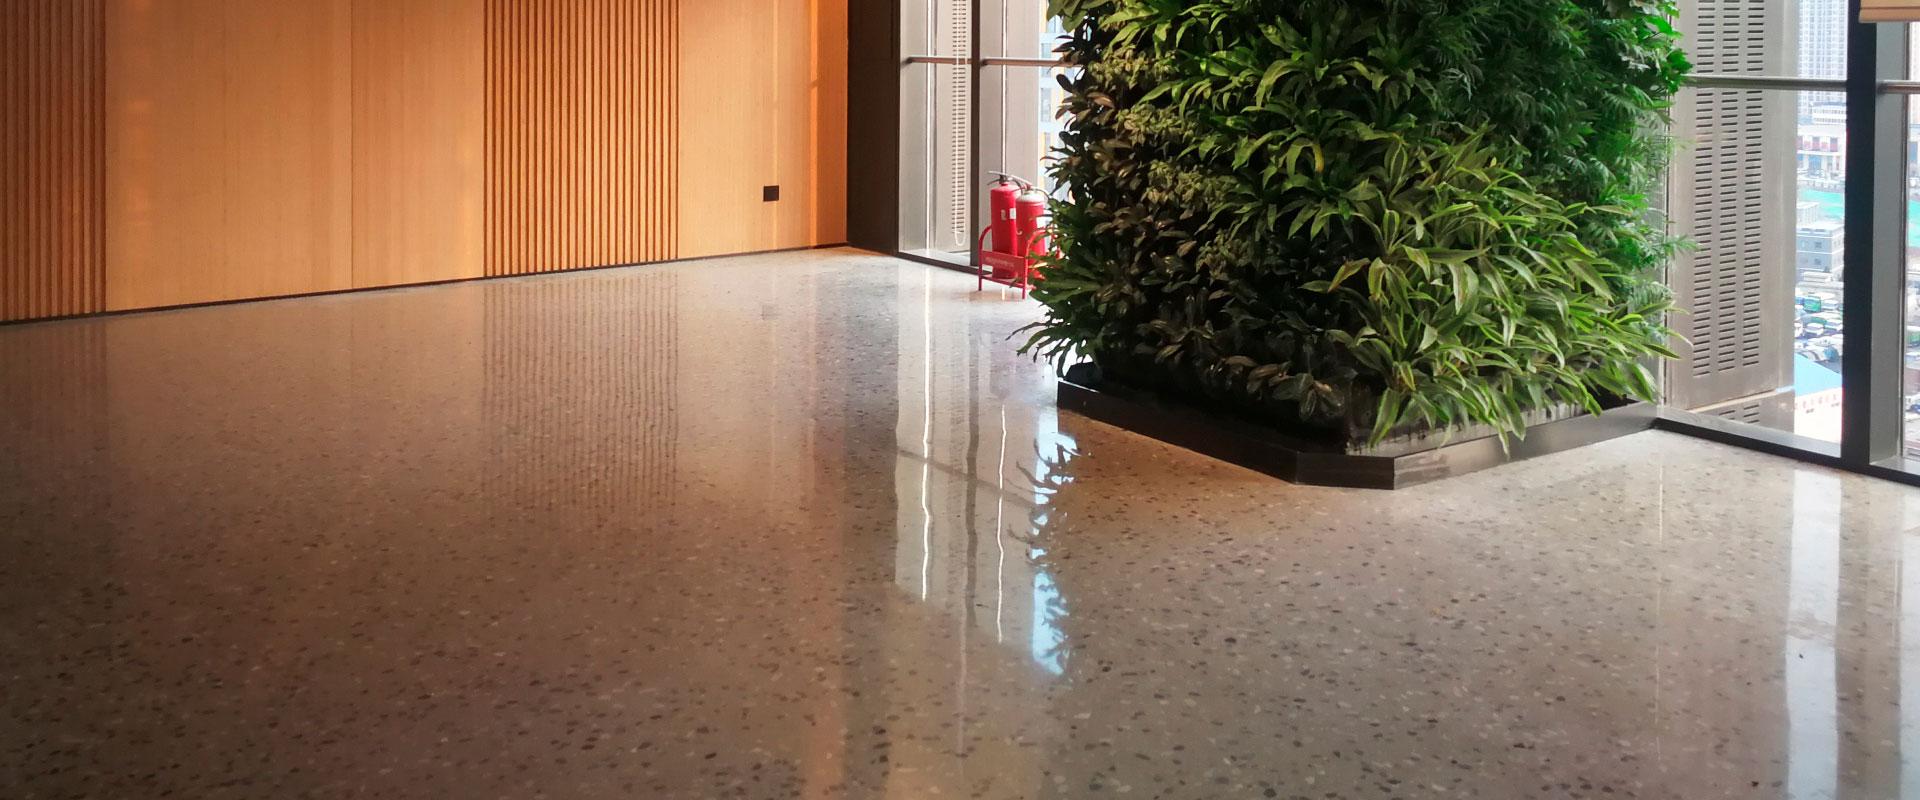 AGGLOTECH-progetto-office-pechino-slider-4